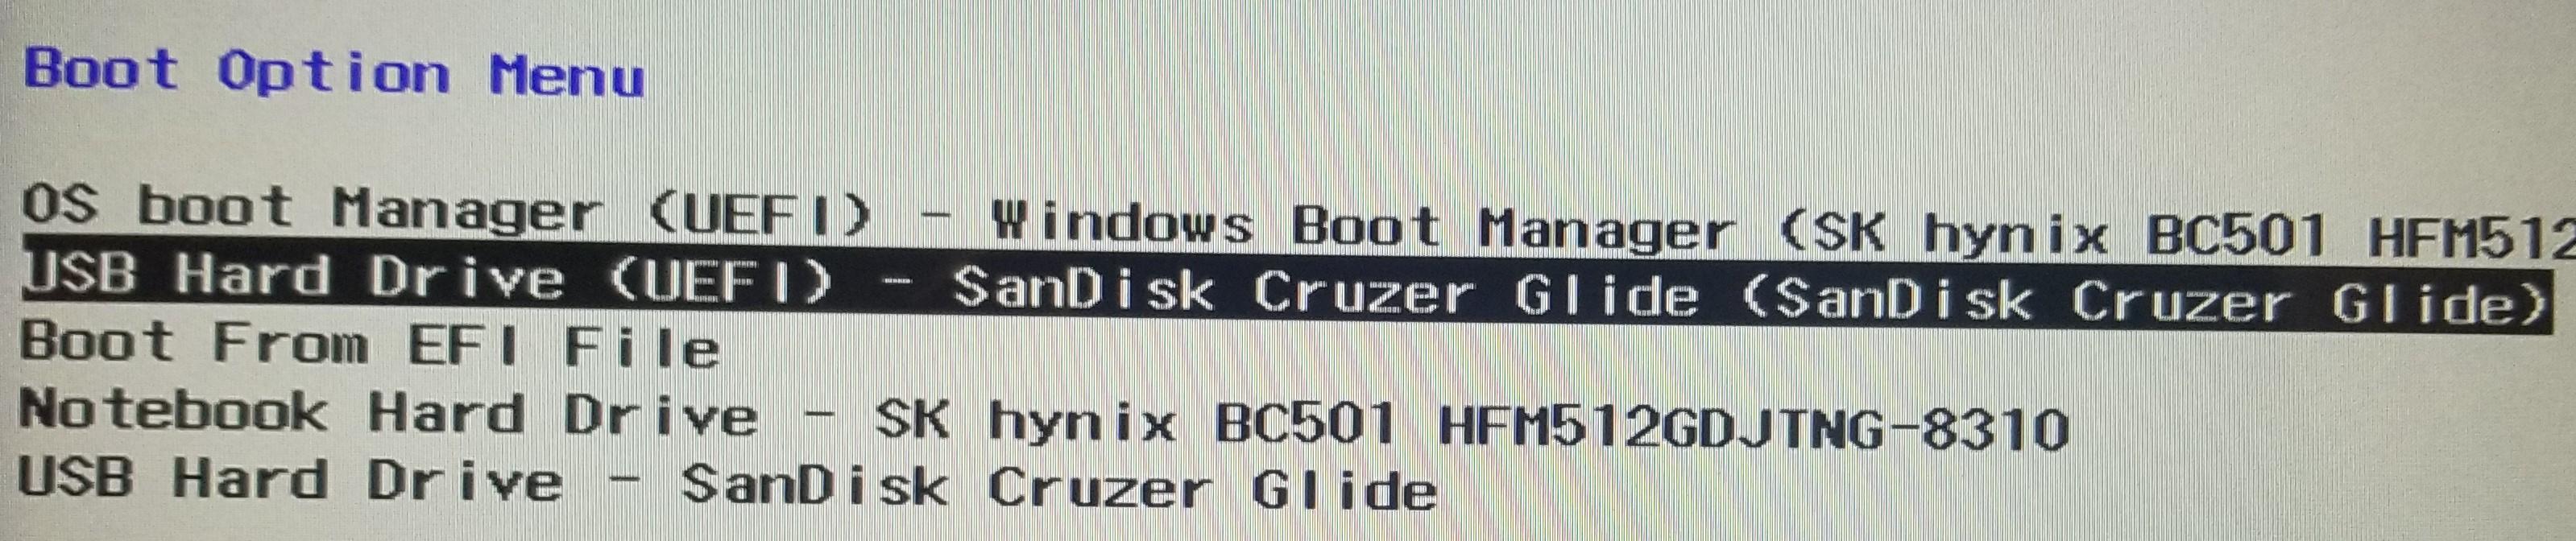 USB Hard Drive (EUFI) - SanDisk Cruzer Glider